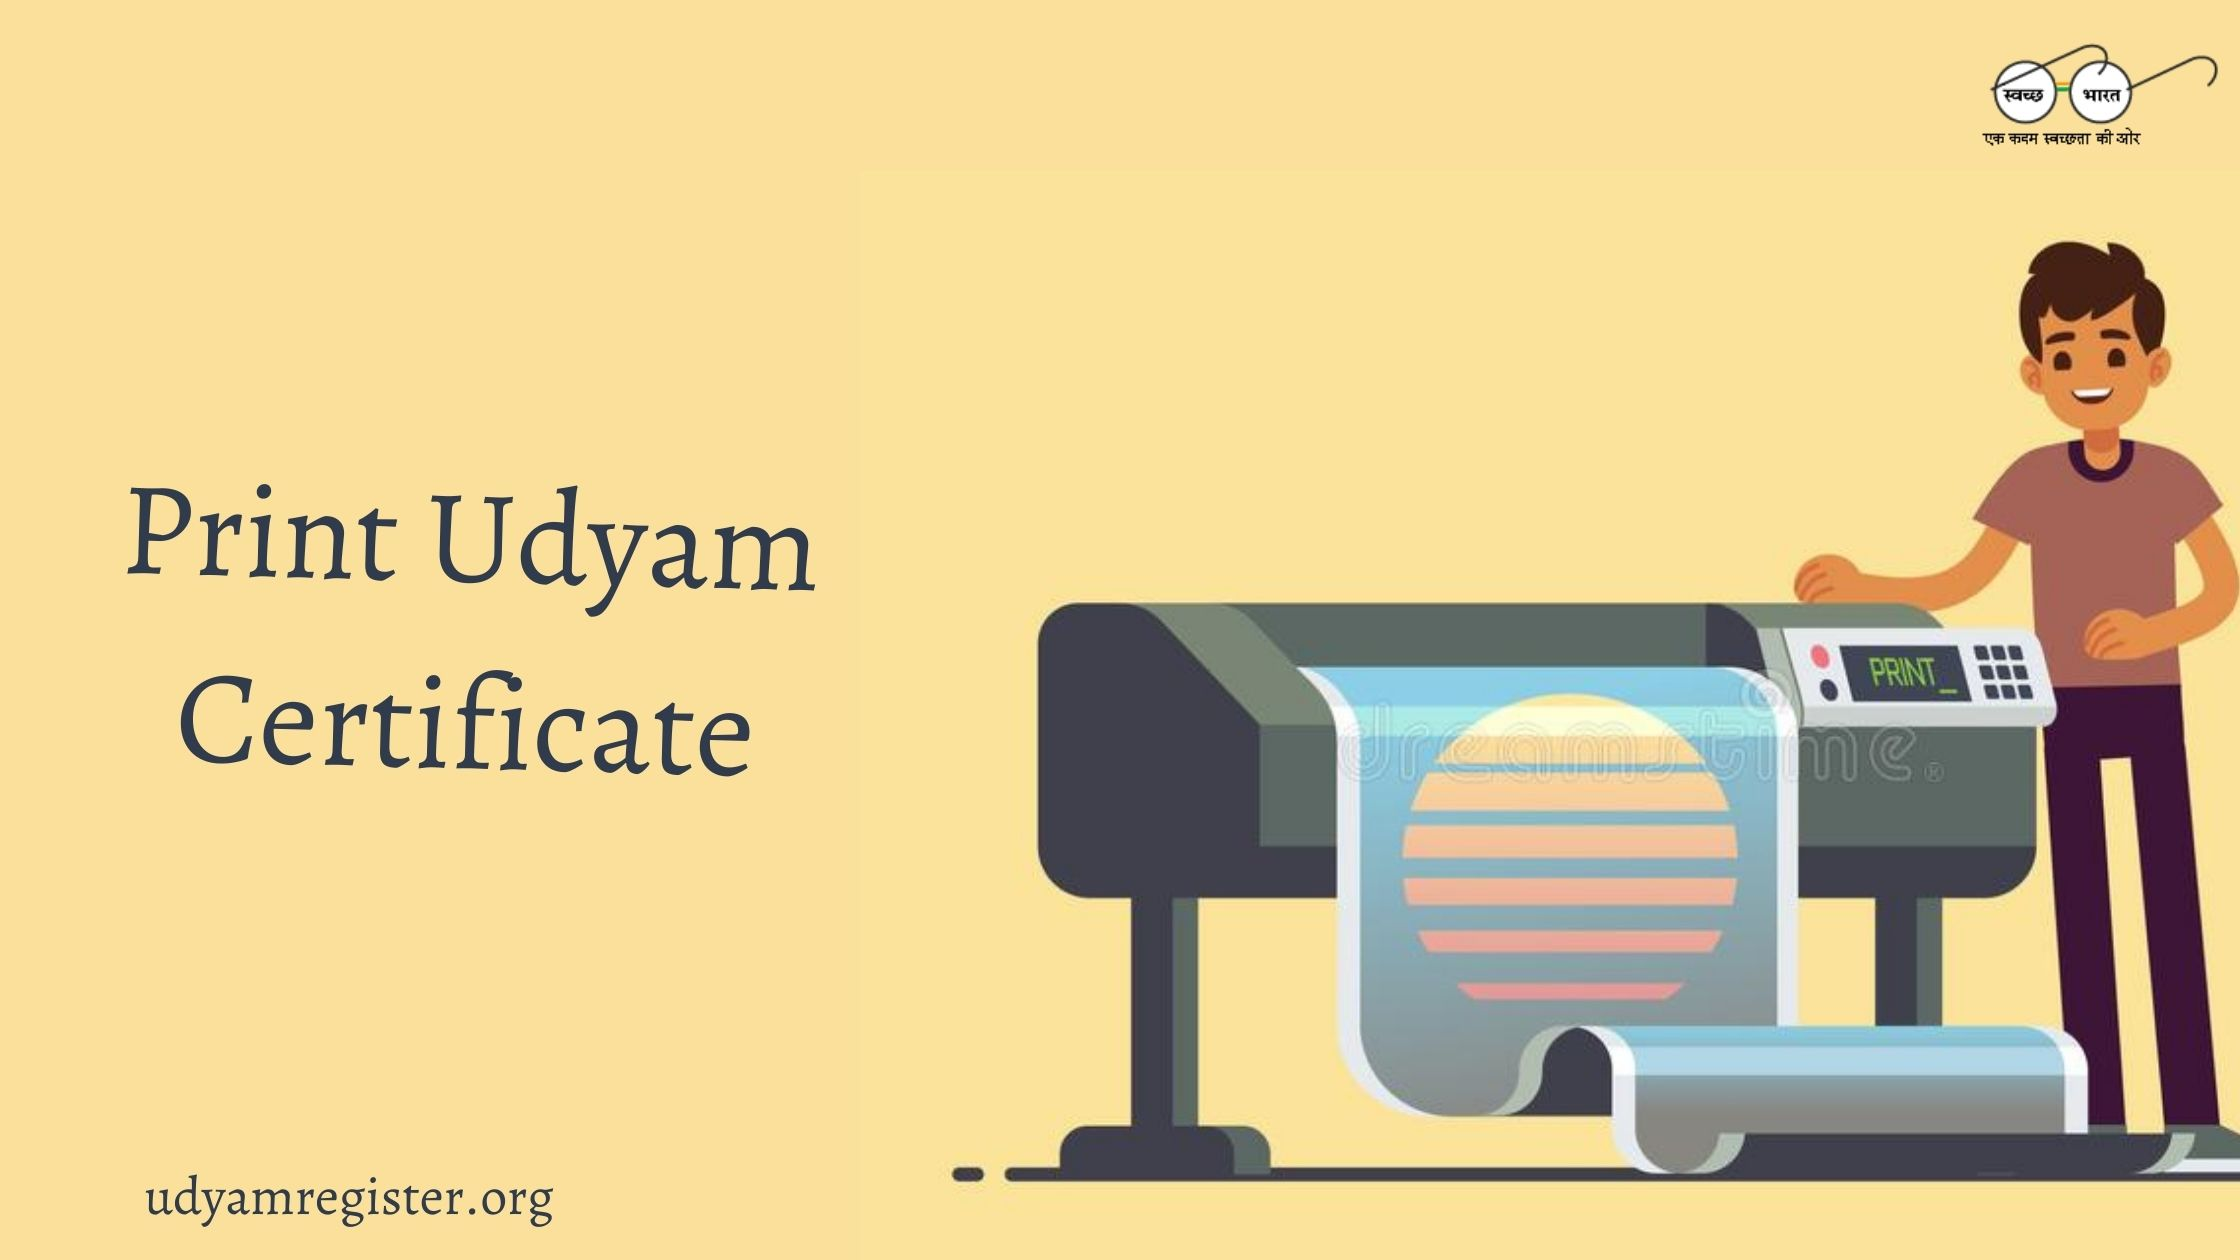 udyam-register